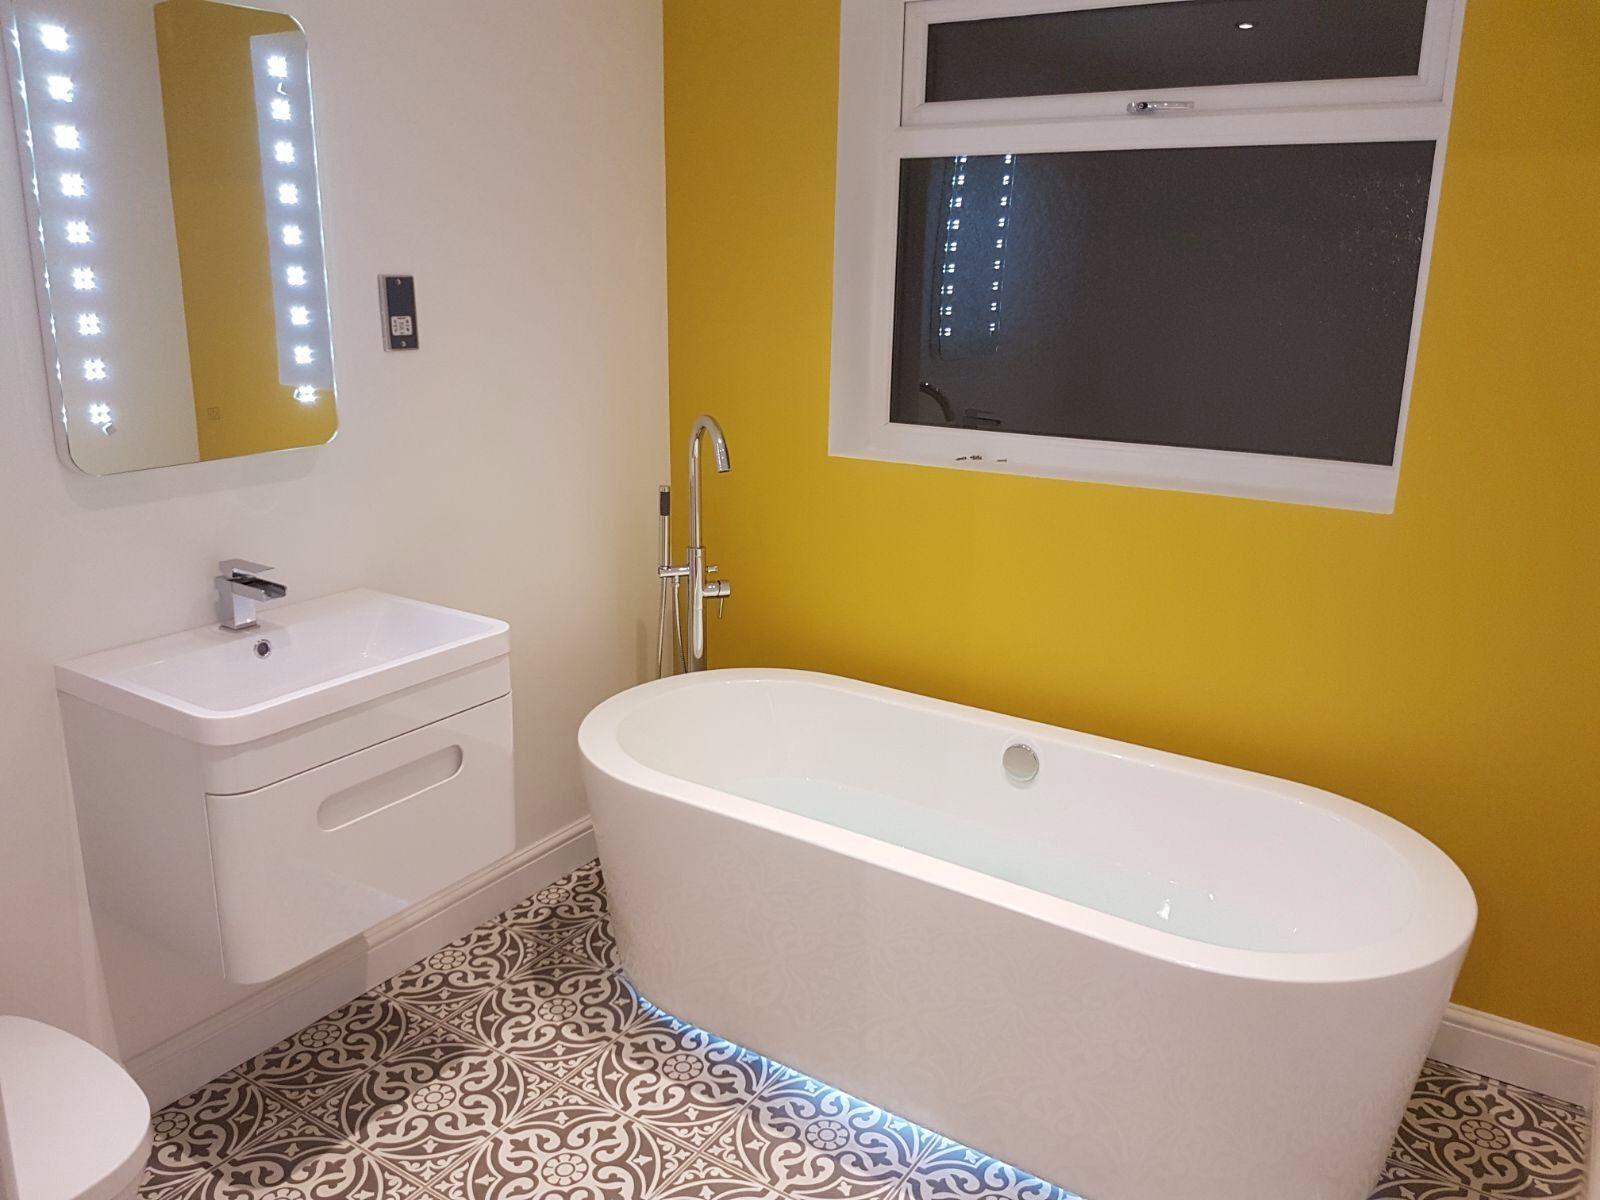 Under bath lighting   Bathroom   Pinterest   Bath light, Bath and Lights